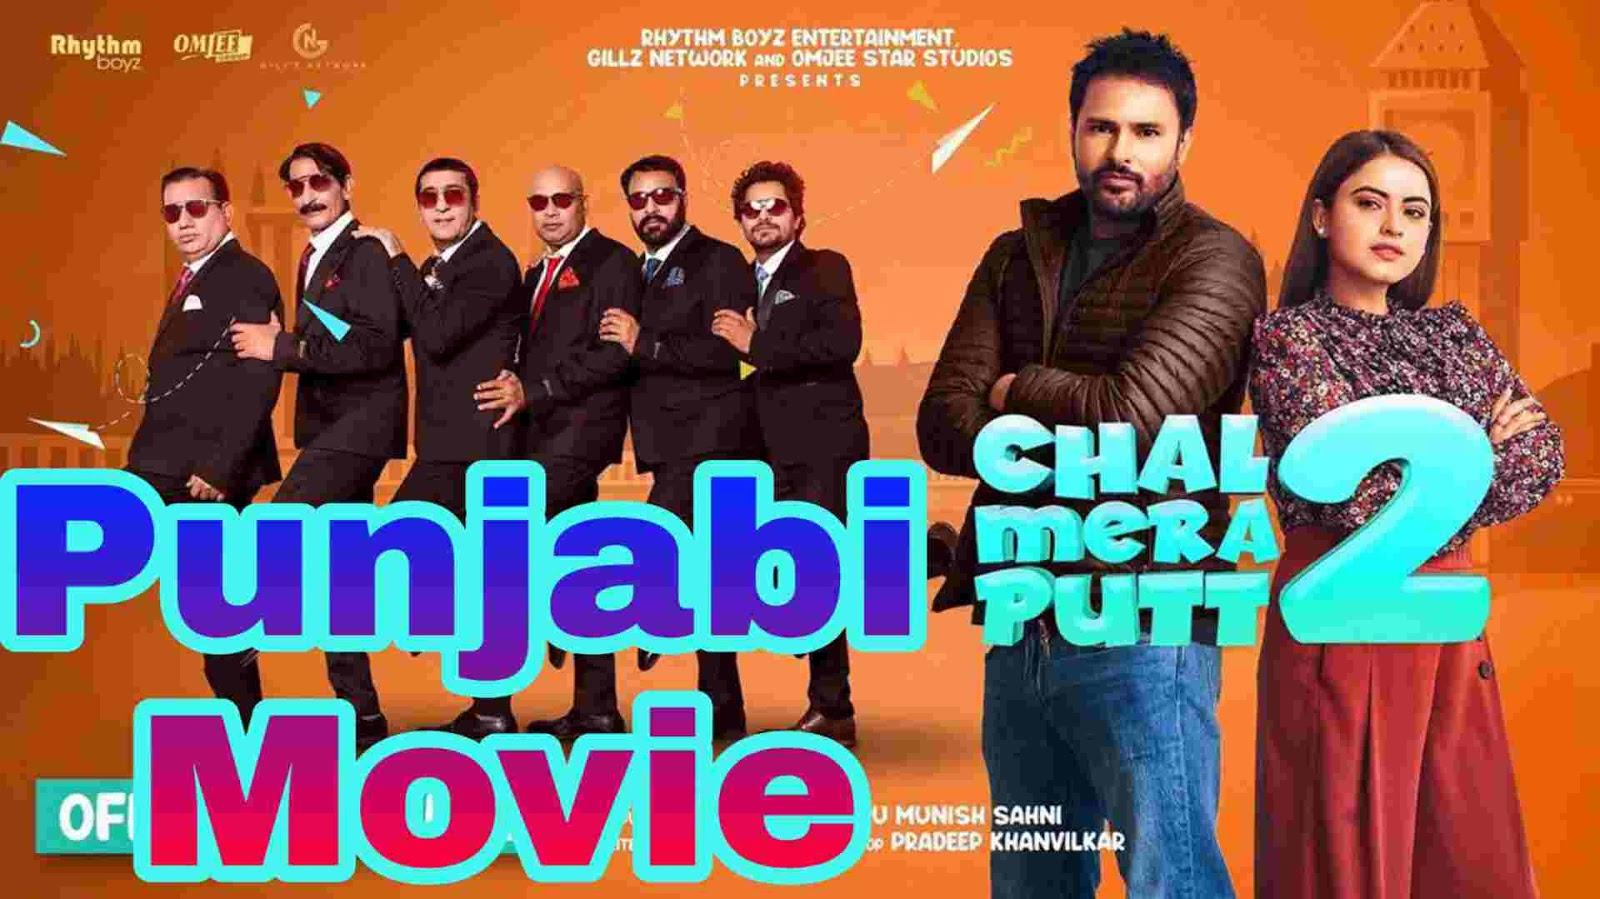 download Chal Mera Putt 2 filmywap